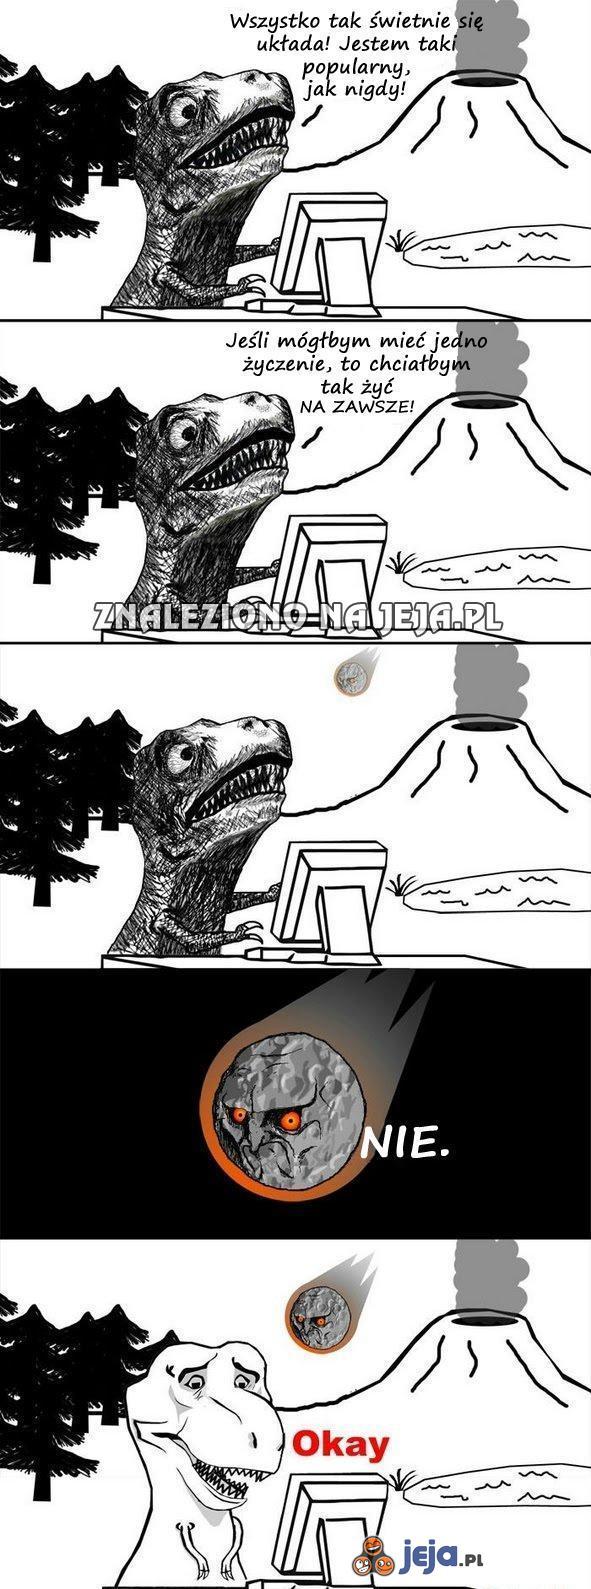 Historia popularnego dinozaura